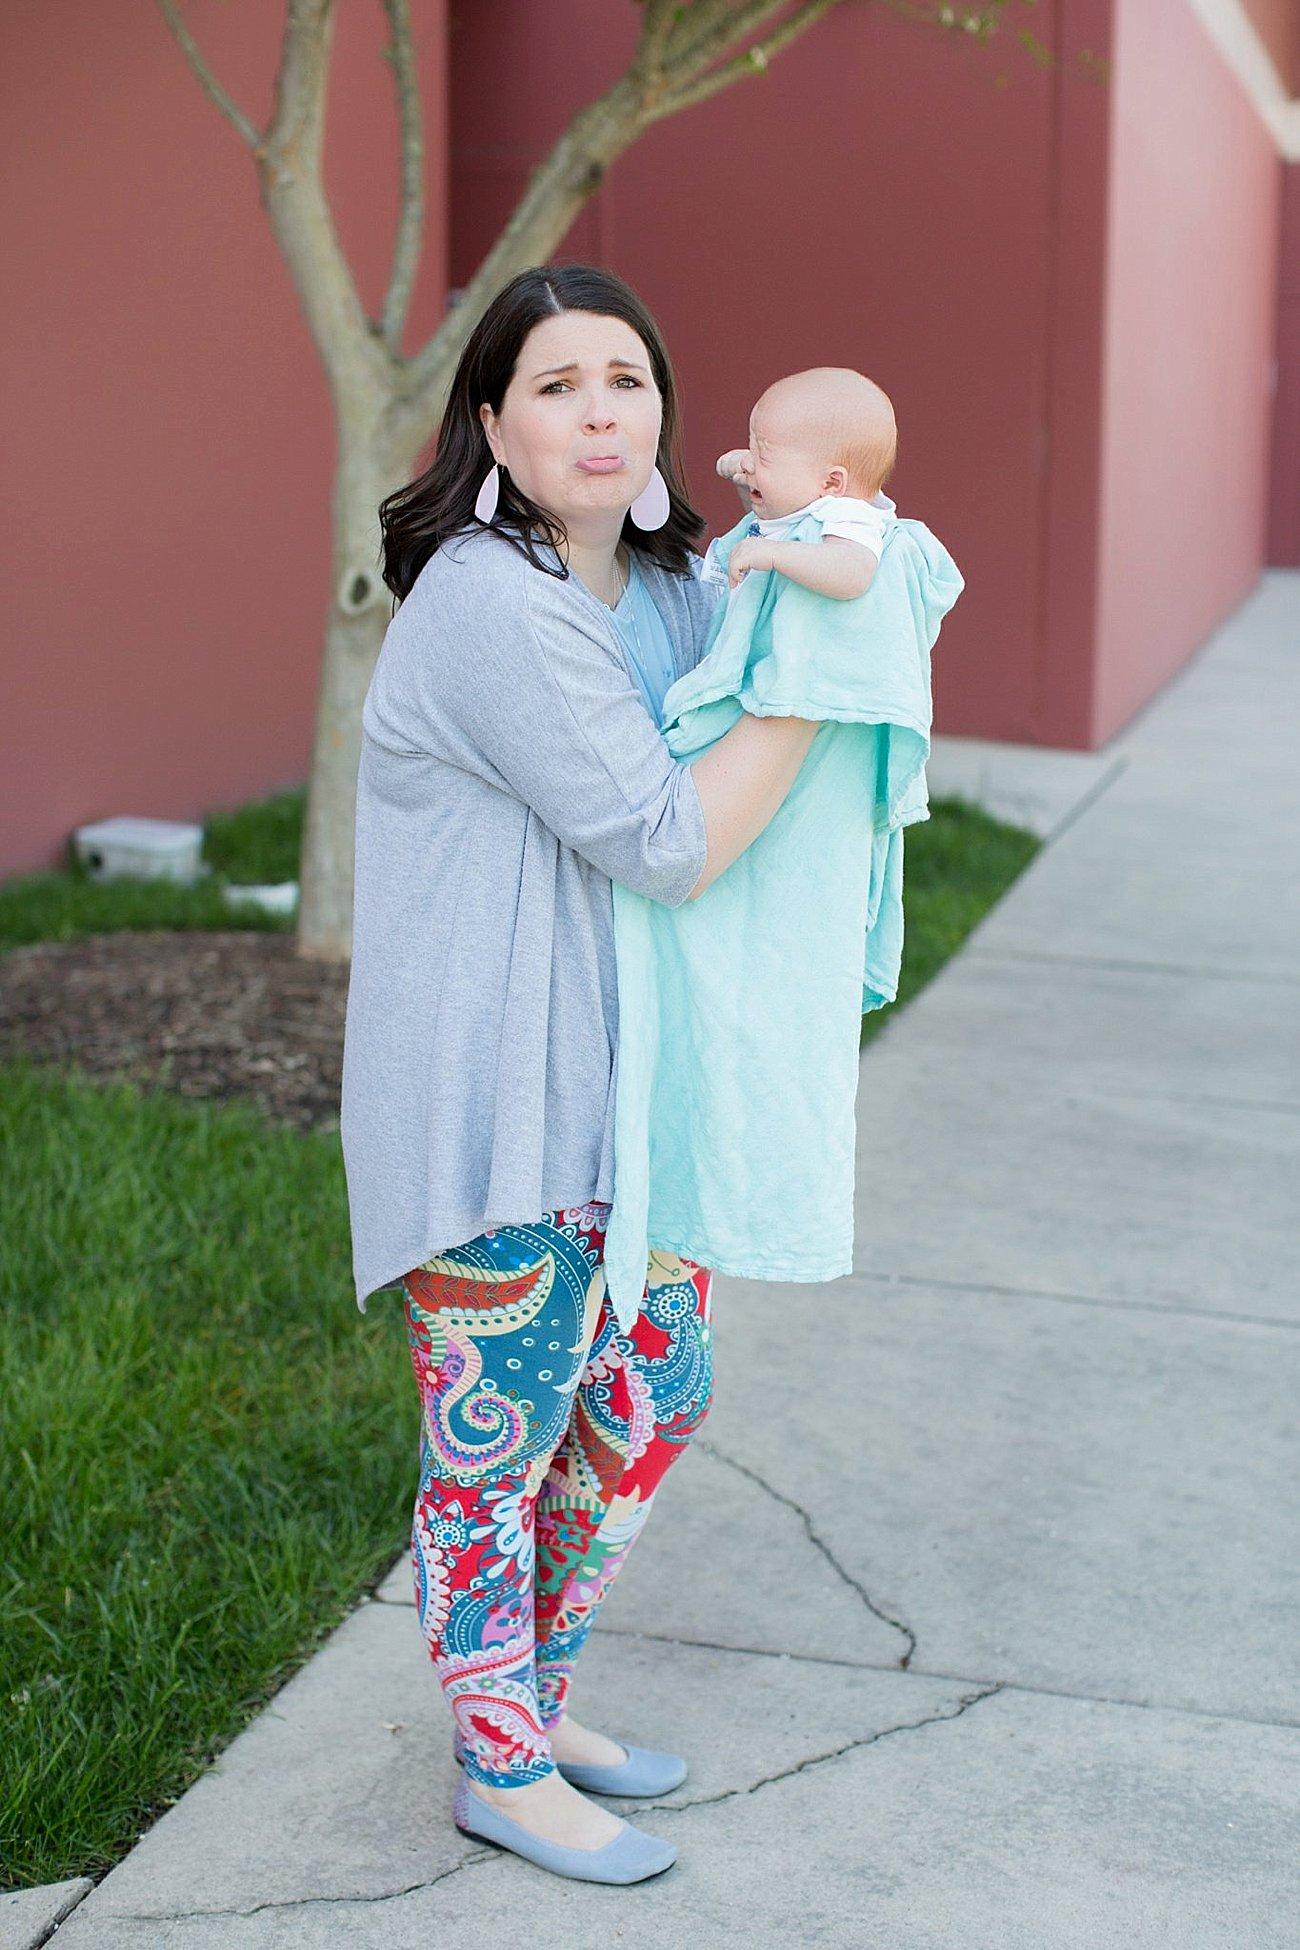 LulaRoe Lindsay Kimono in Grey, Lularoe Irma tunic, Paisley printed LulaRoe leggings, The Root Collective Gaby Ballet Flat, Nickel and Suede Earrings | Mom Style | North Carolina Fashion & Style Blogger (11)